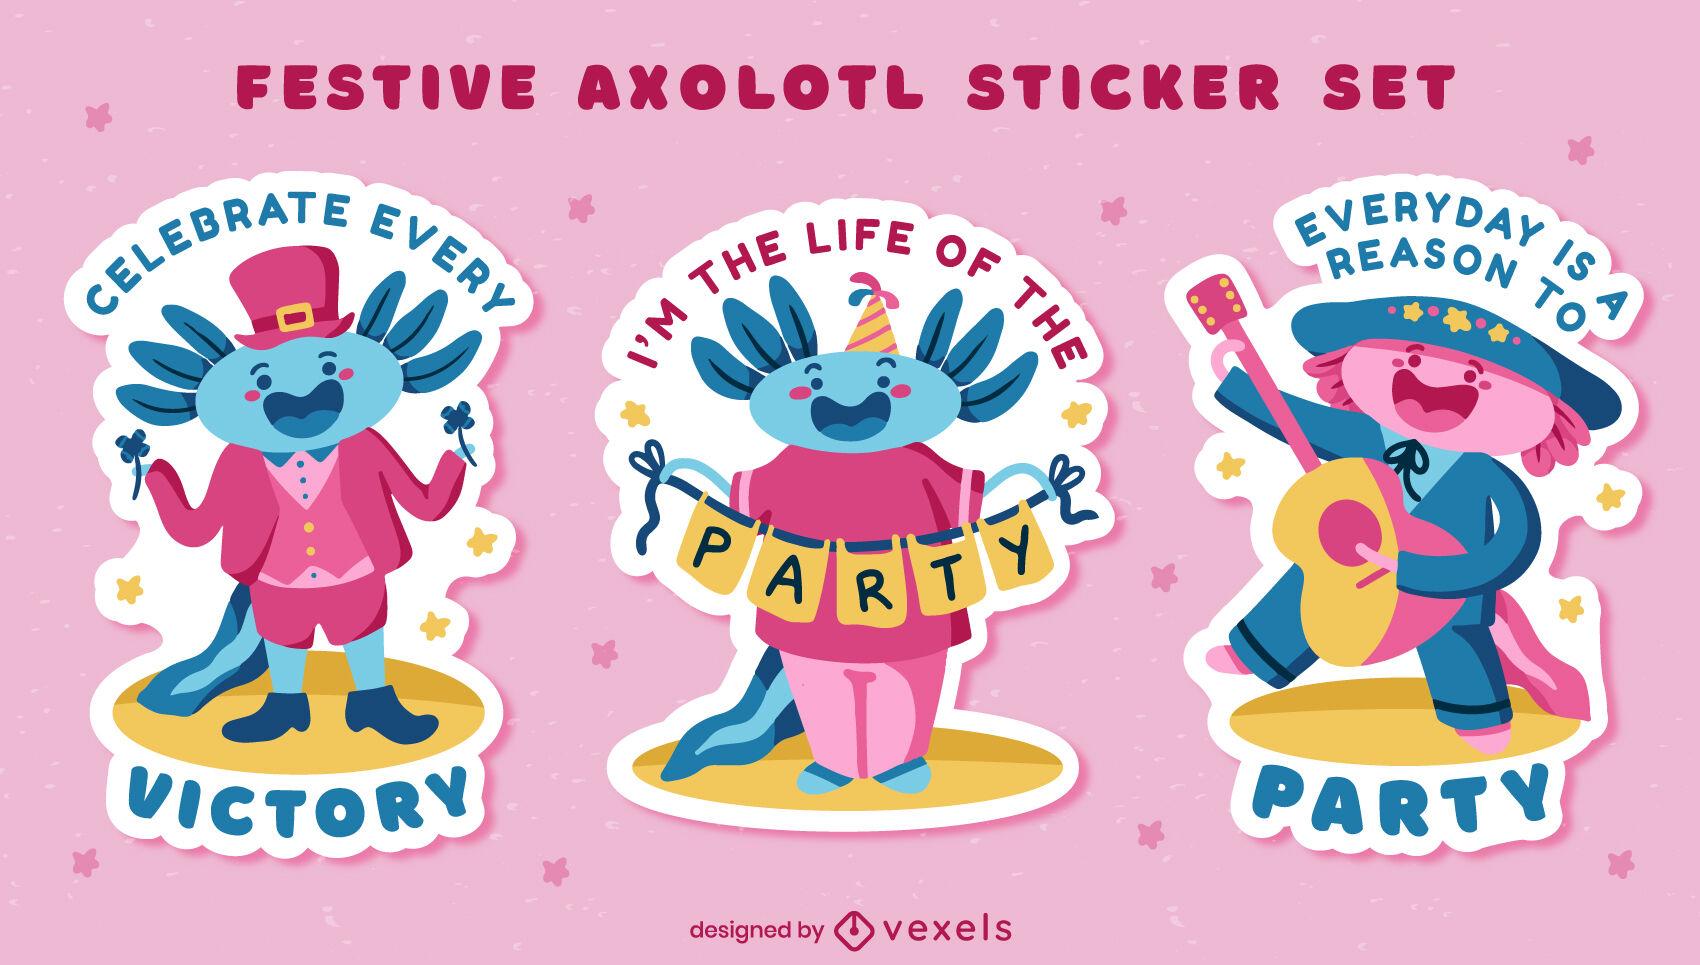 Lindo conjunto de pegatinas festivas axolotl